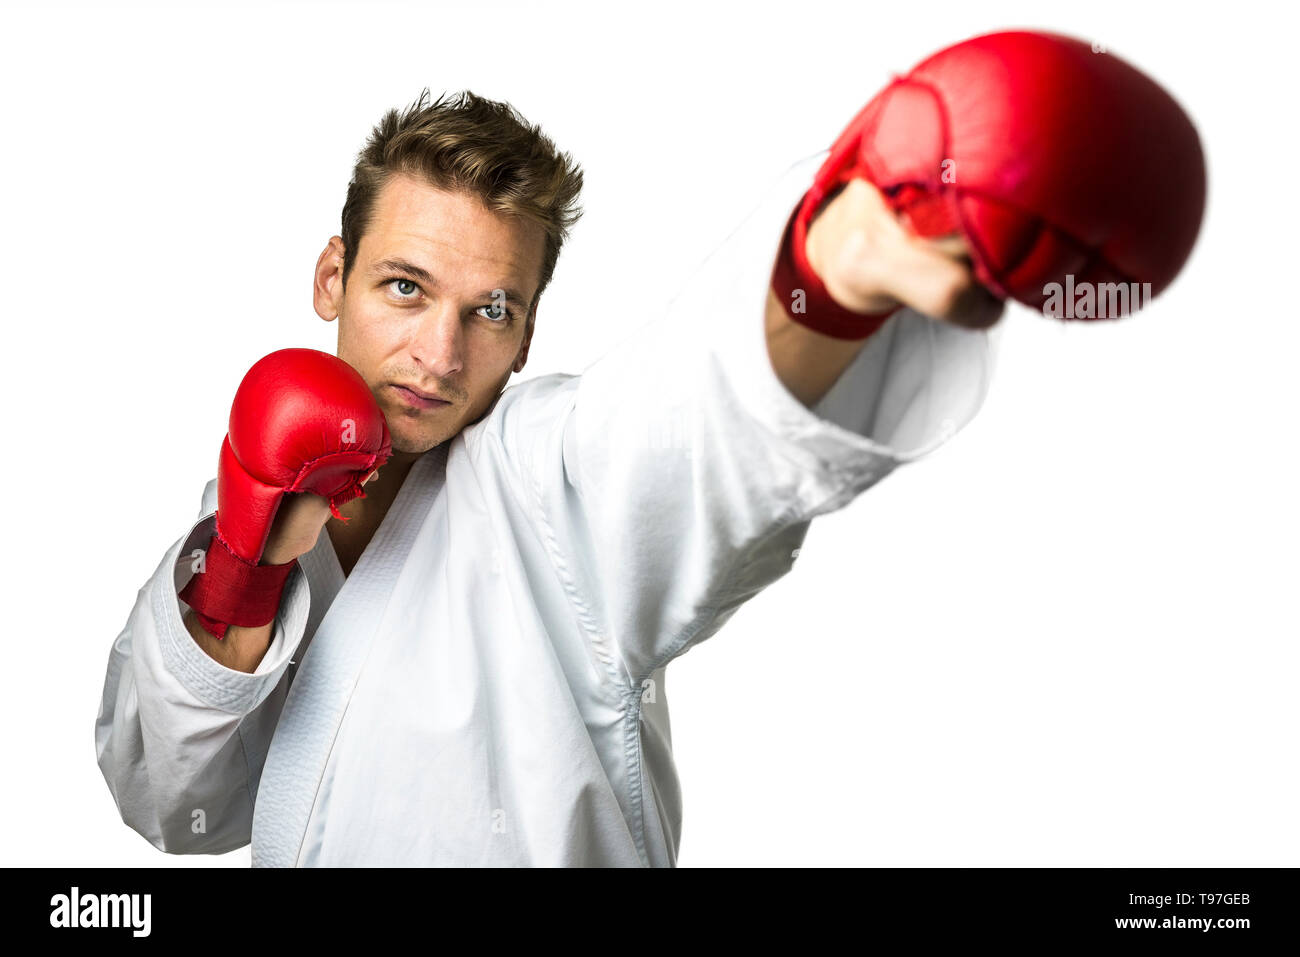 Professional kickboxer isolated over white background. - Stock Image